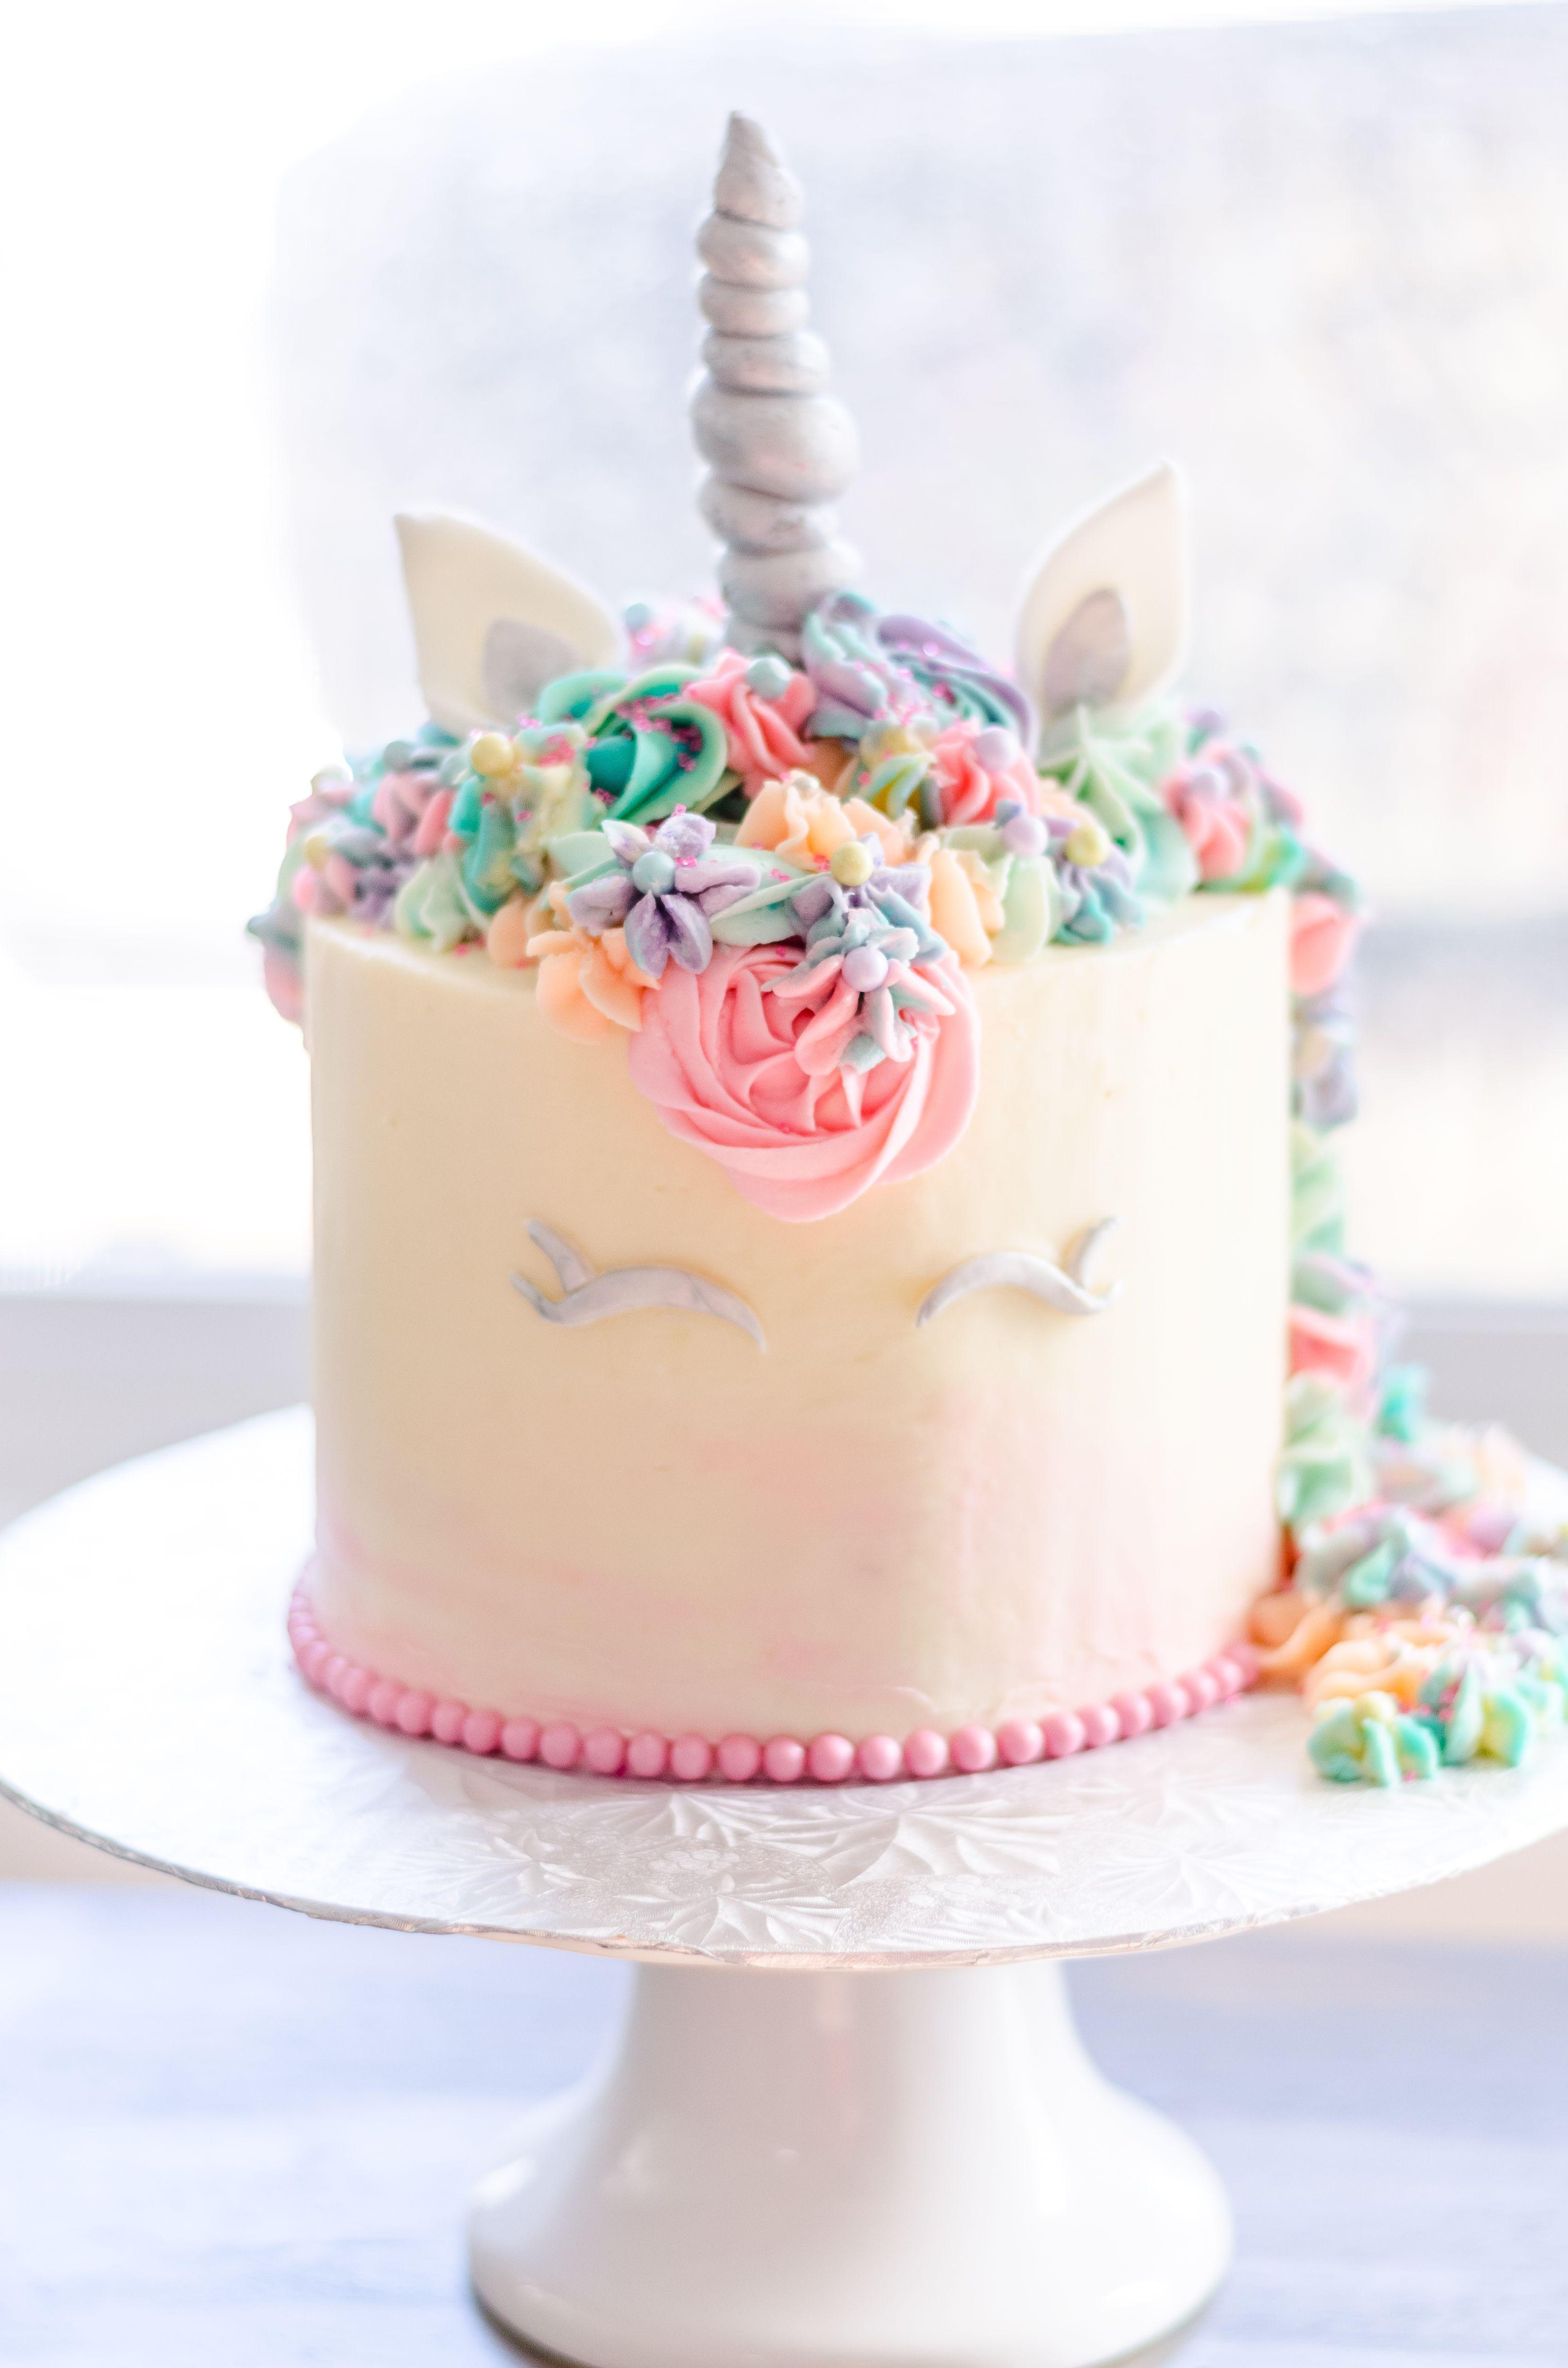 Unicorn Cake Decorating Ideas Birthday Cakes For Teens Teen Parties